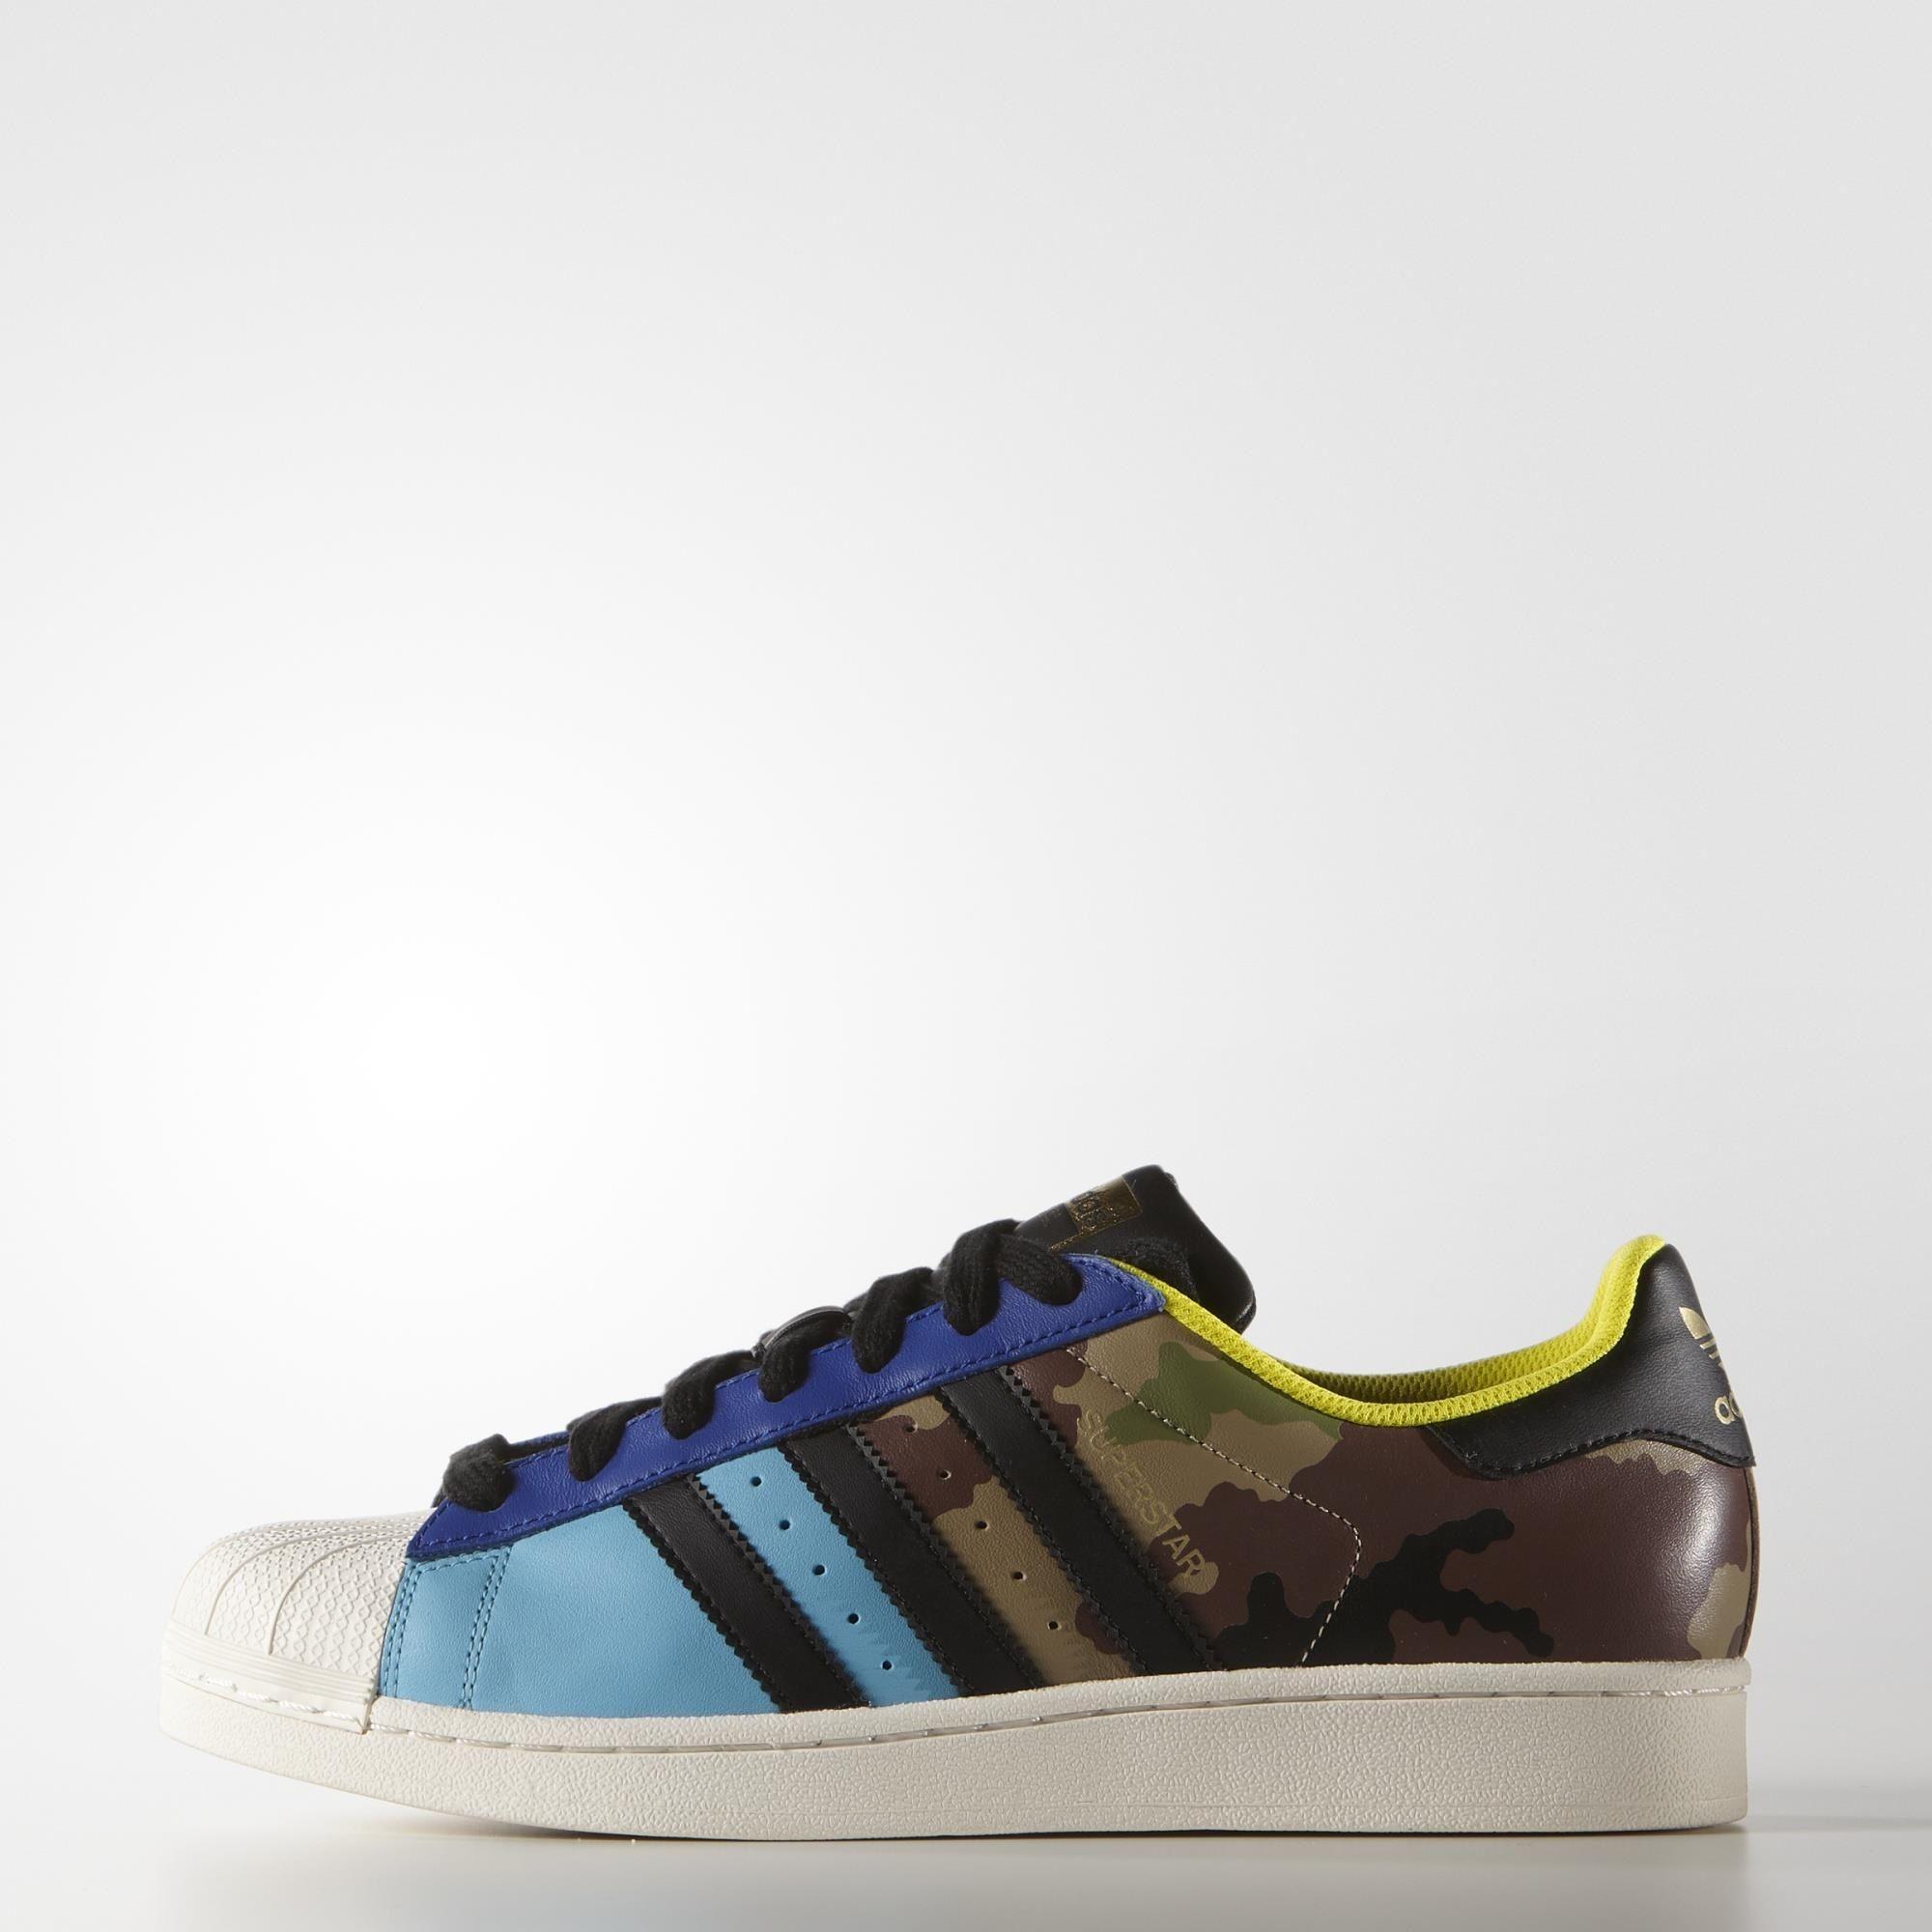 adidas superstar scarpe adidas noi qichinobebi stranezza confezione blu